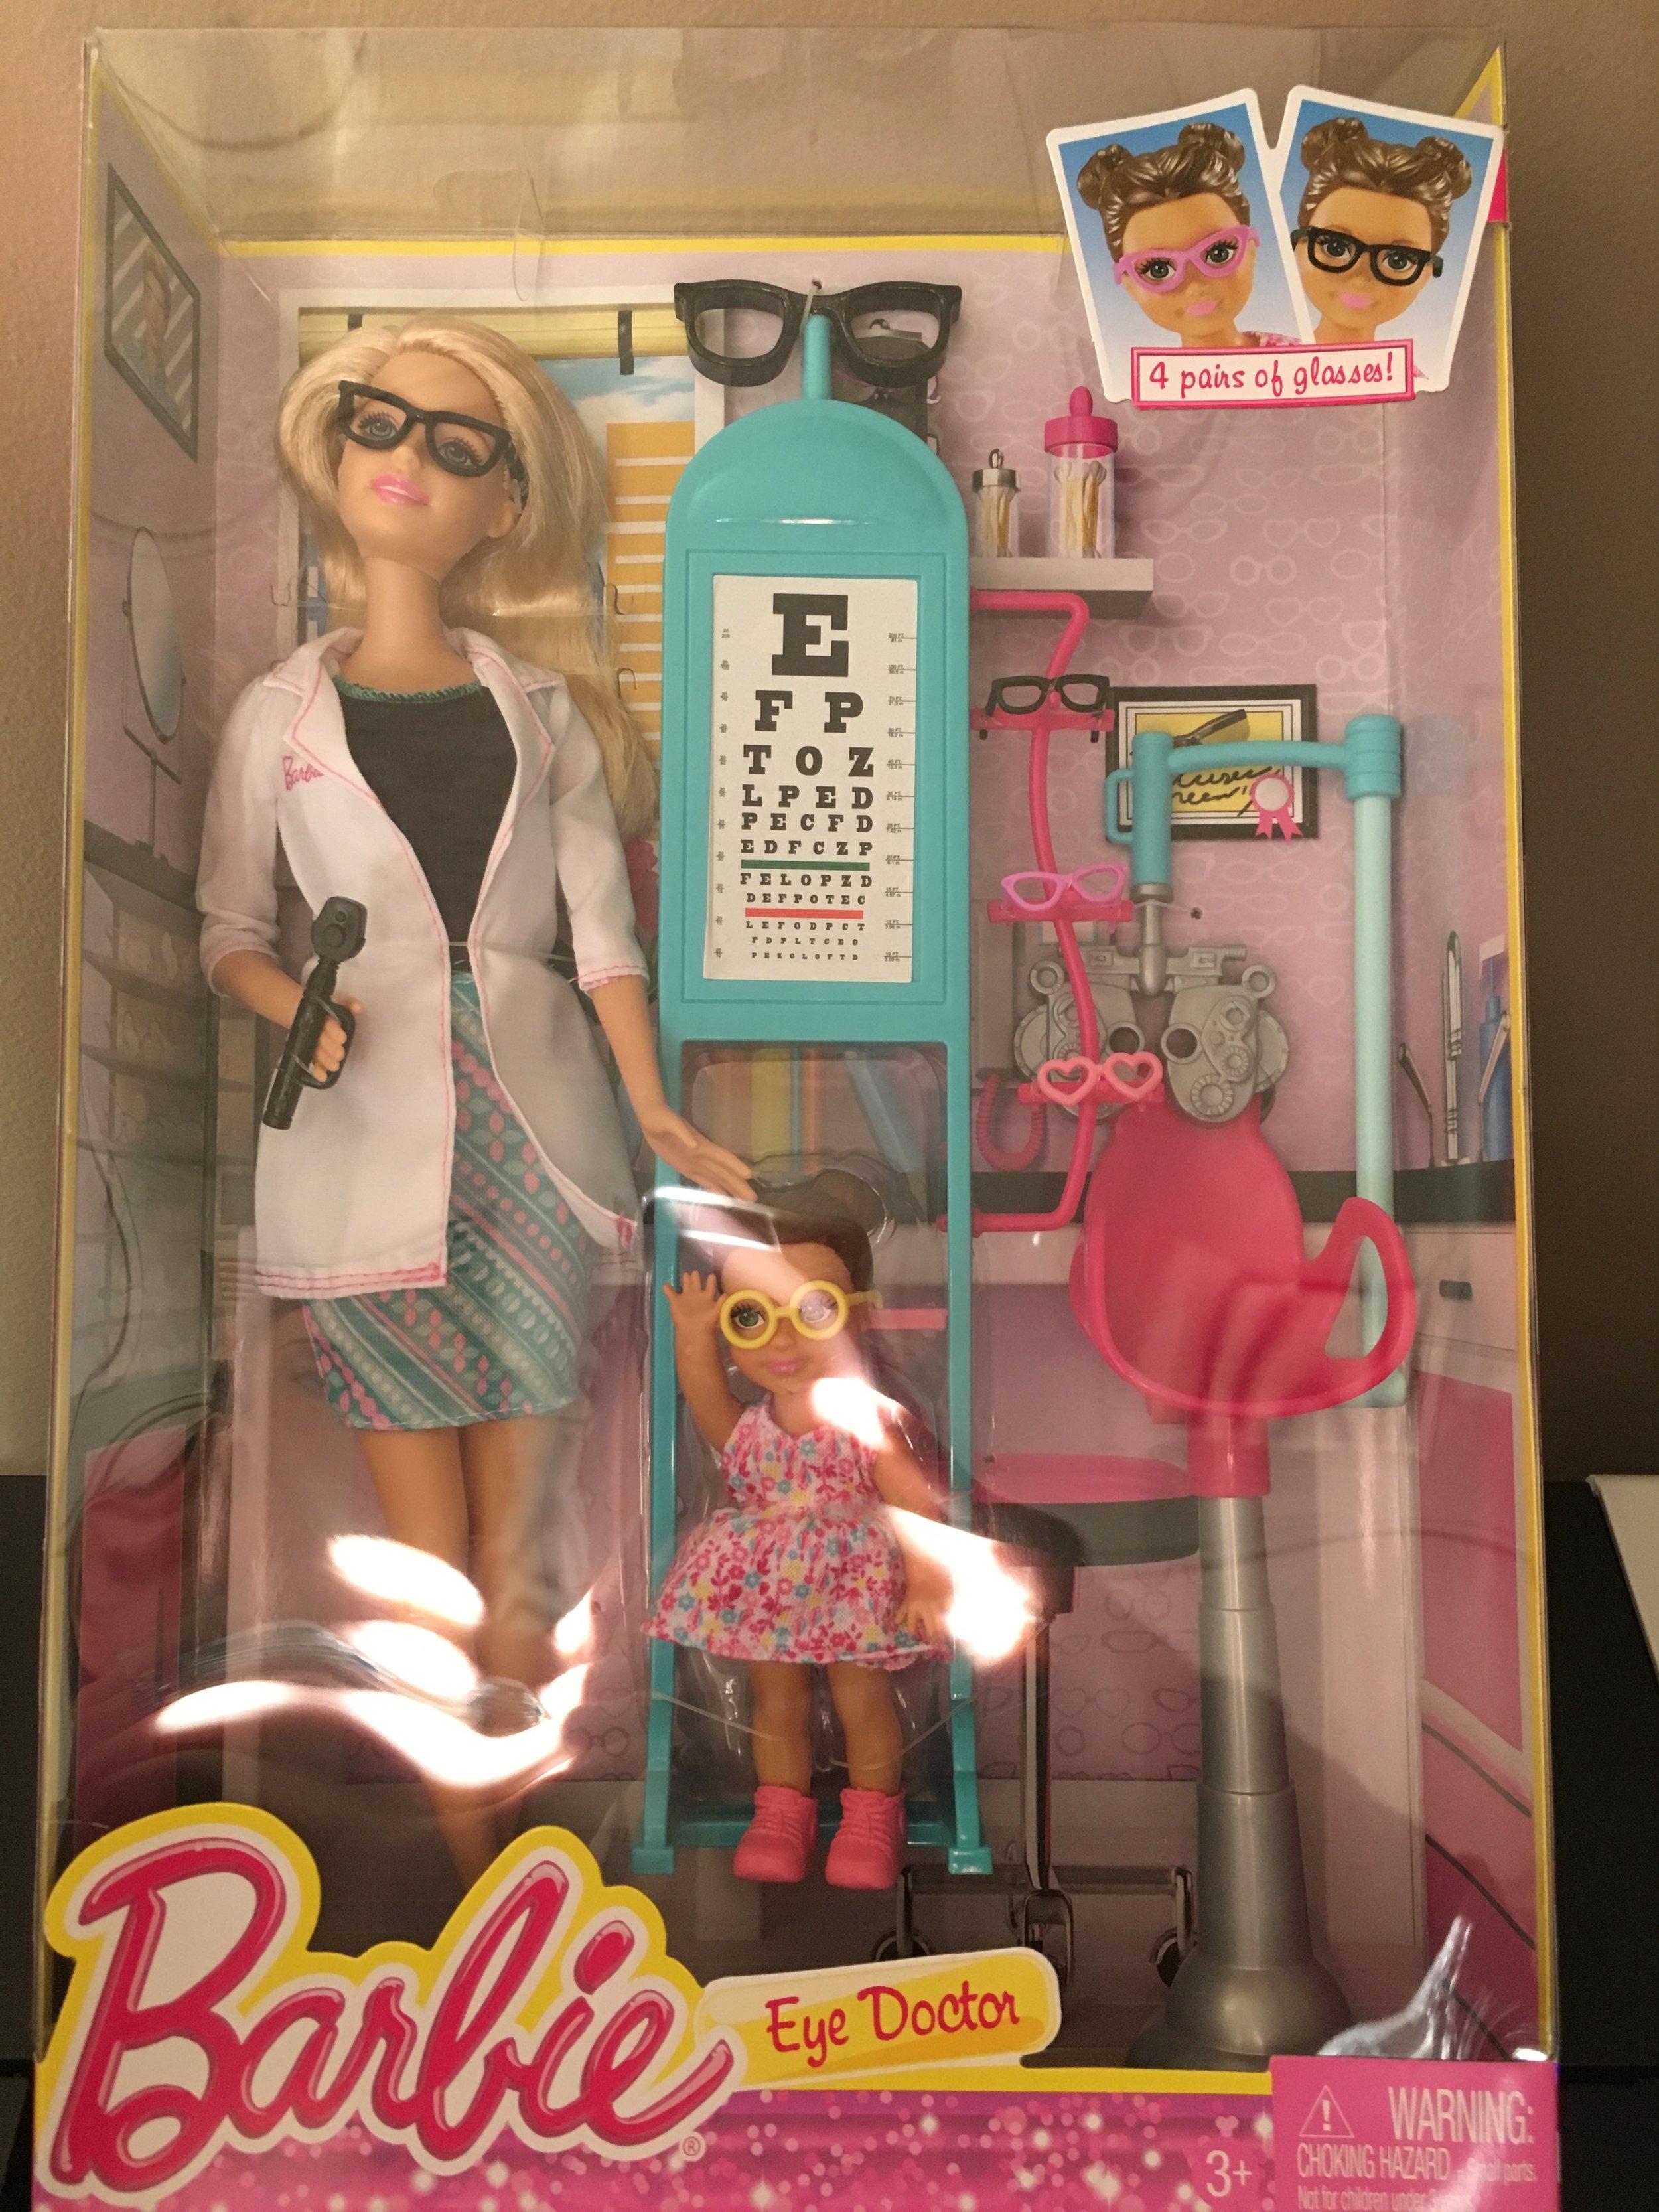 Need I say more? Barbie Eye Doctor!